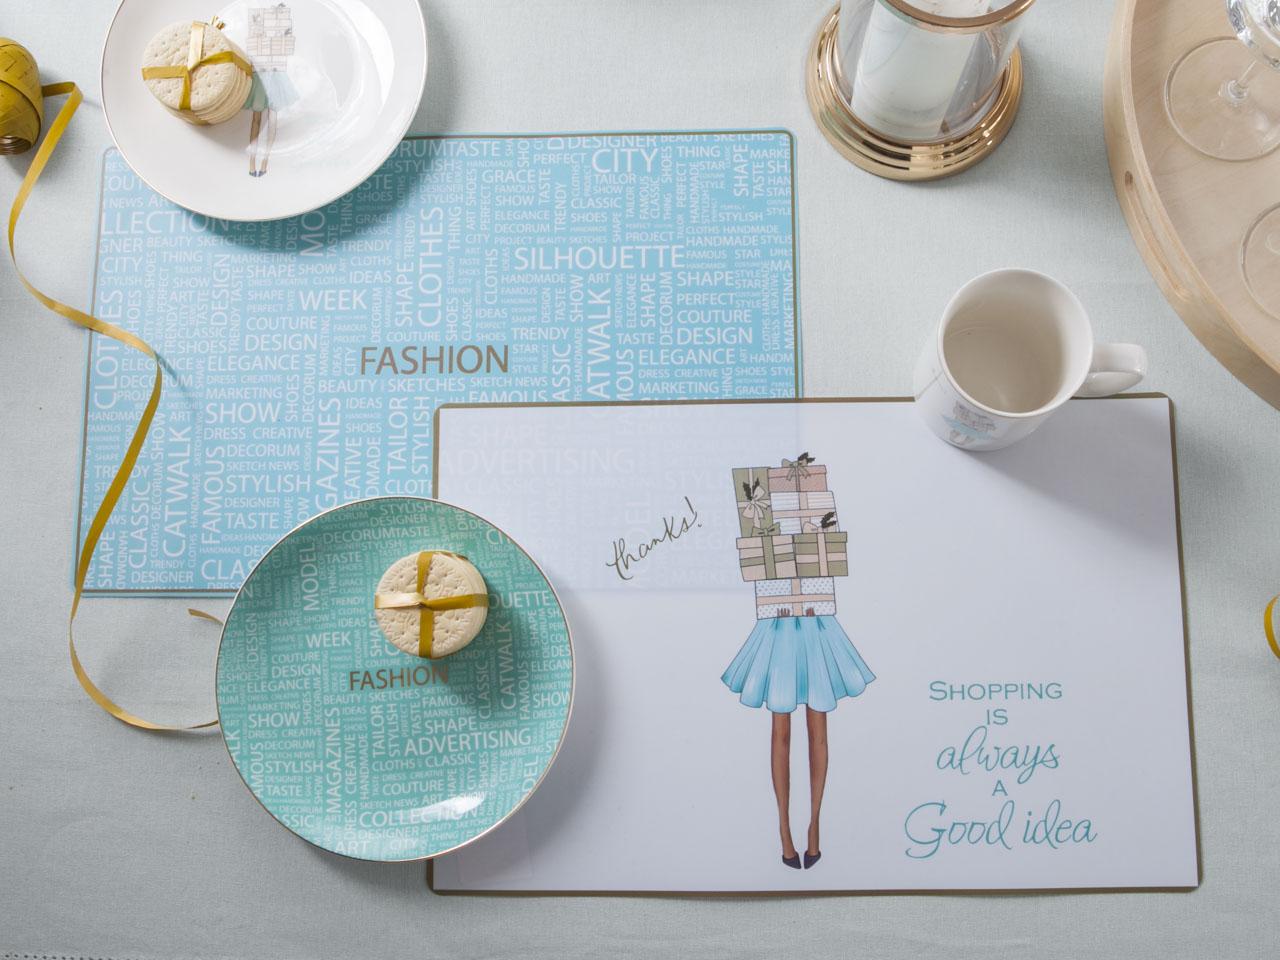 Podkładka / Mata na stół Altom Design Fashion 28x43 cm (2 wzory)